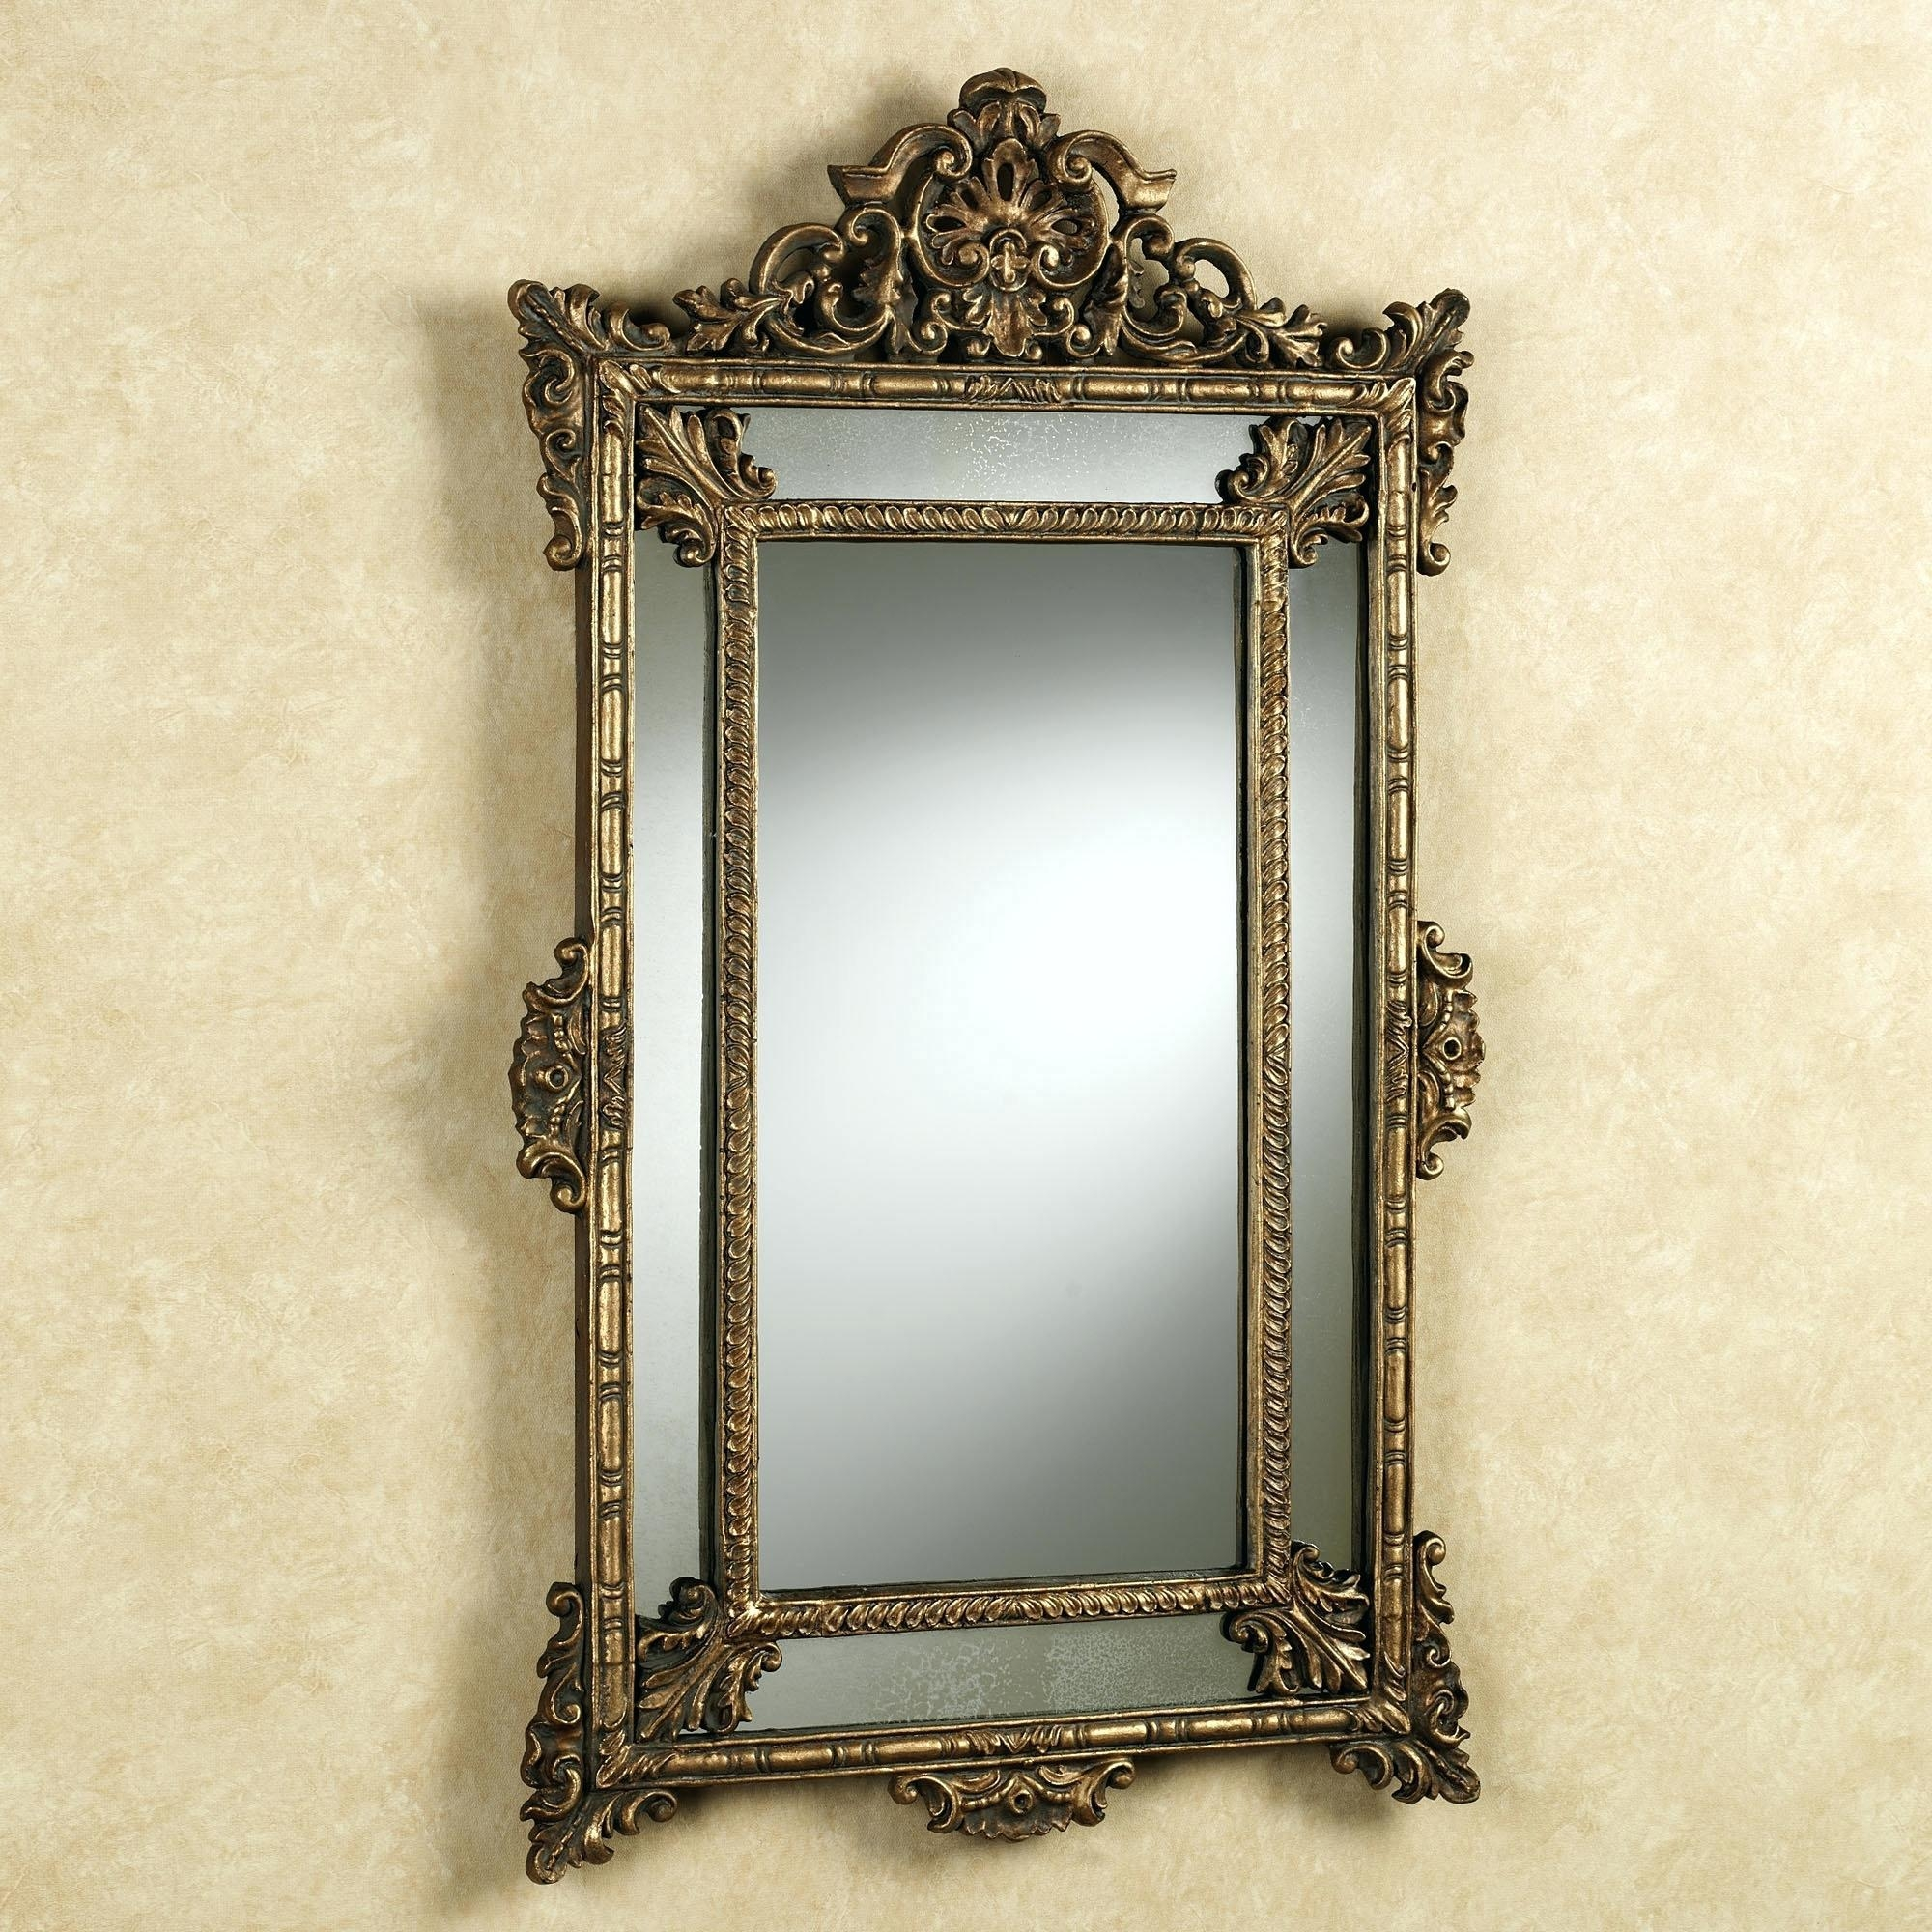 Vintage Wall Mirror Hd Walls Find Wallpapersantique Silver Mirrors Inside Vintage Wall Mirrors (Image 17 of 20)